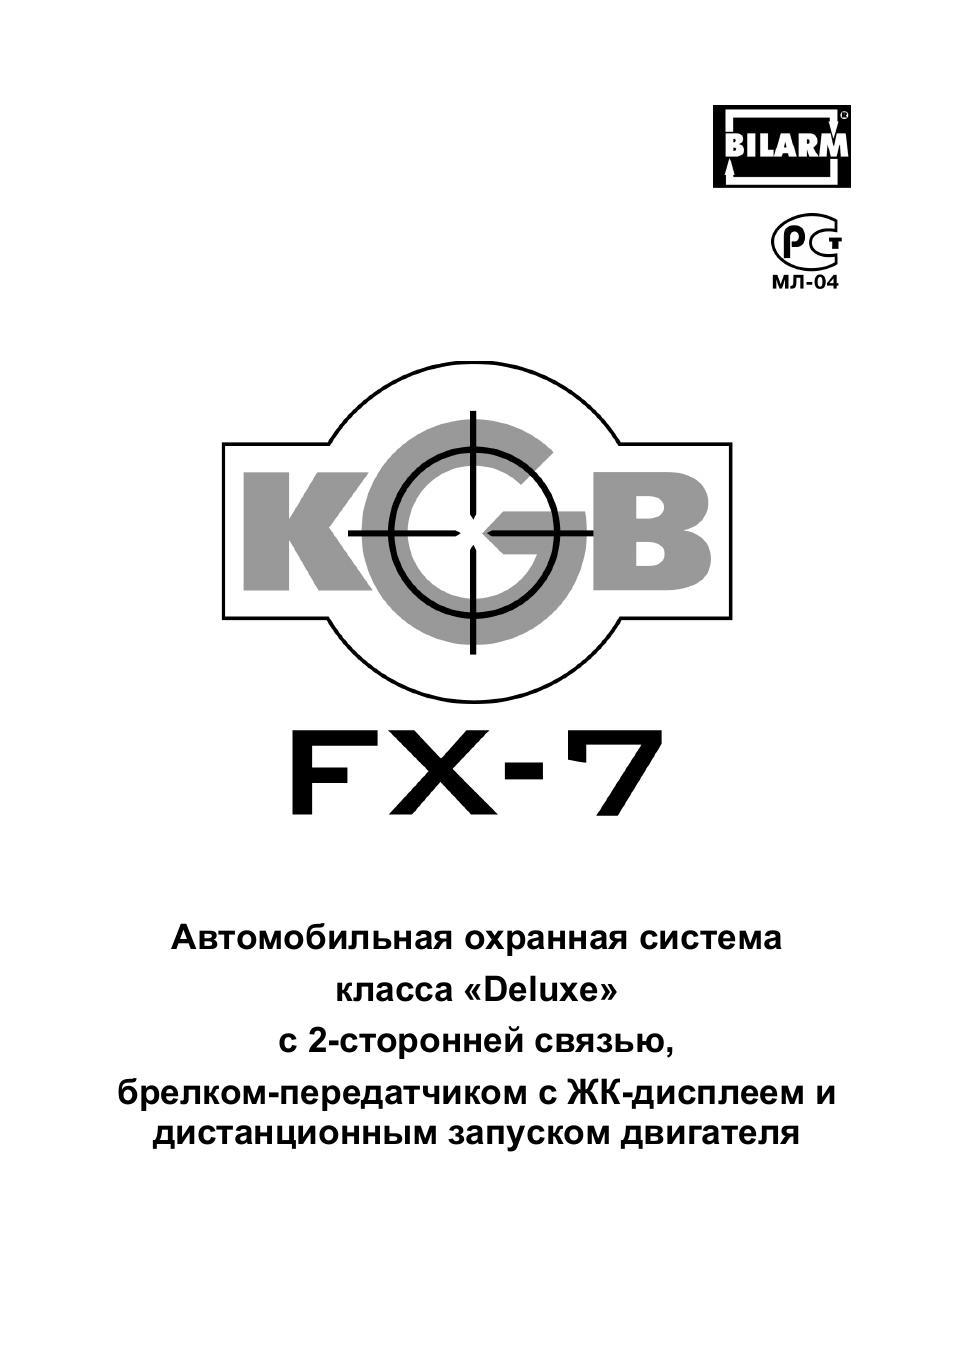 Сигнализация кгб инструкция 7